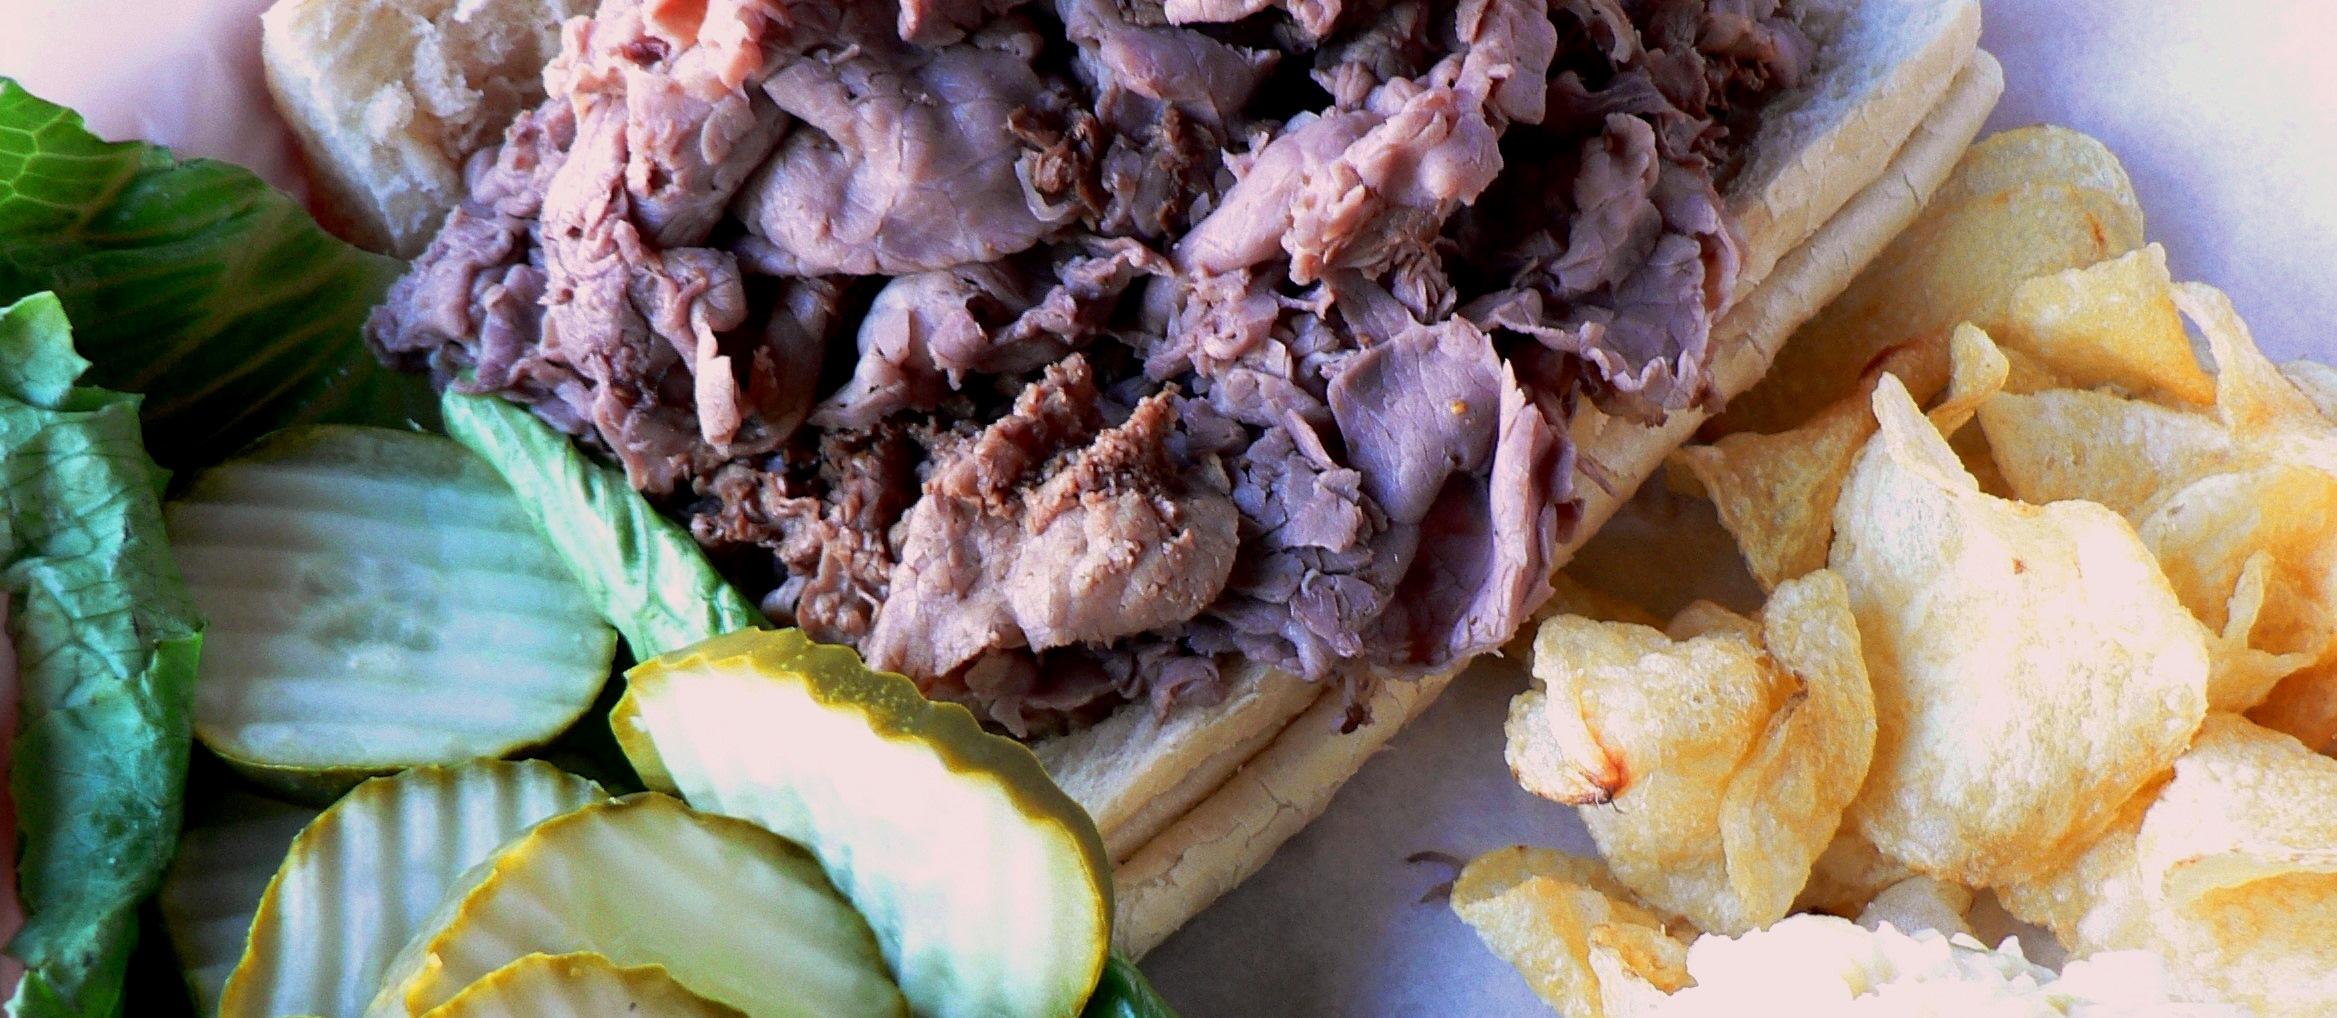 Food & Drink Specials | Murphy's Bleachers – Chicago's World Famo...